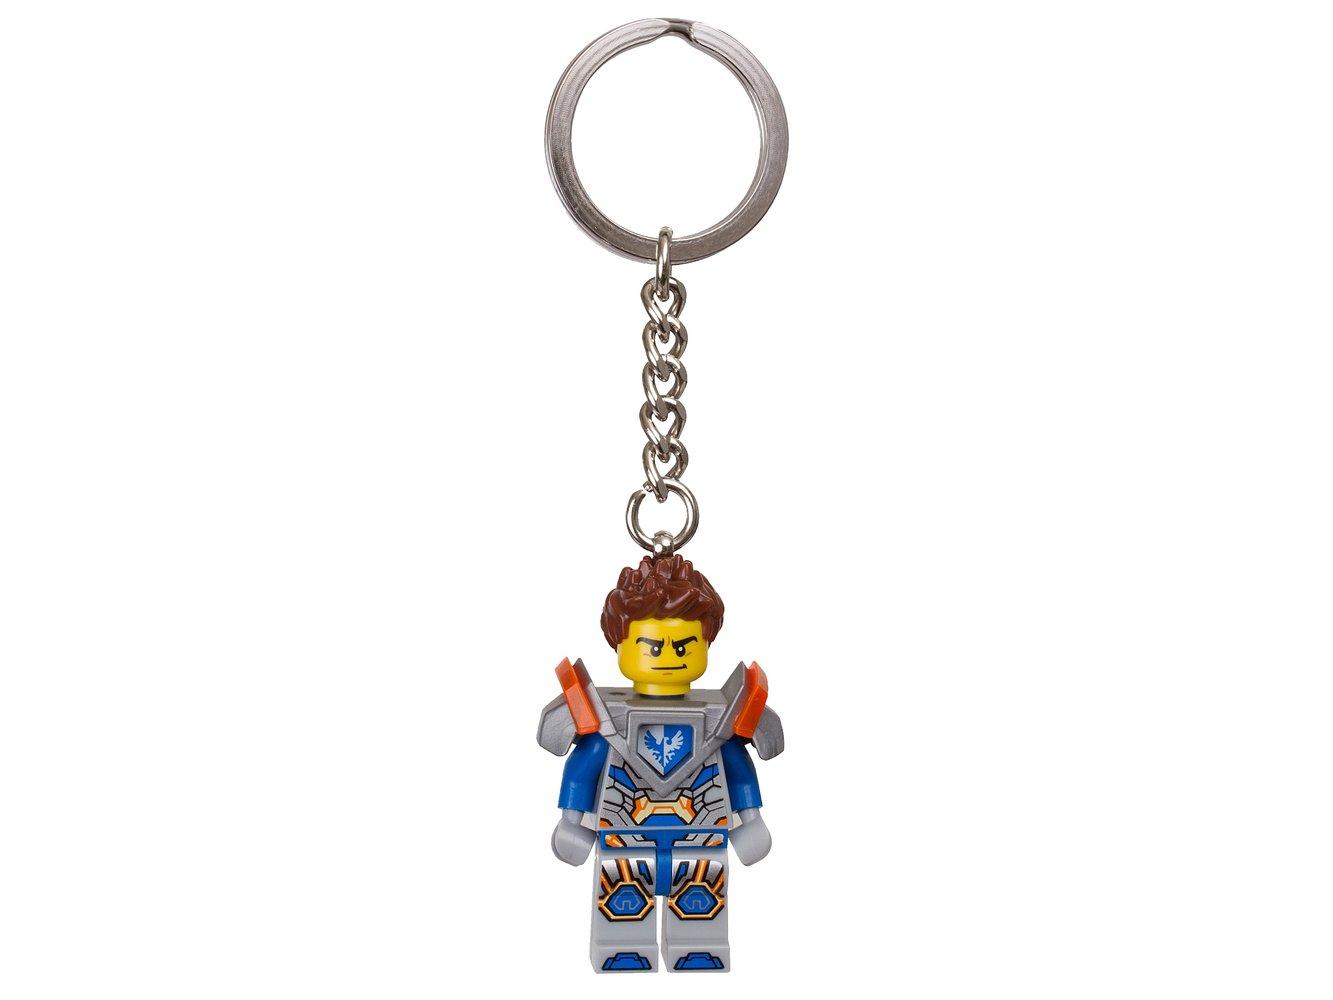 Clay Key Chain